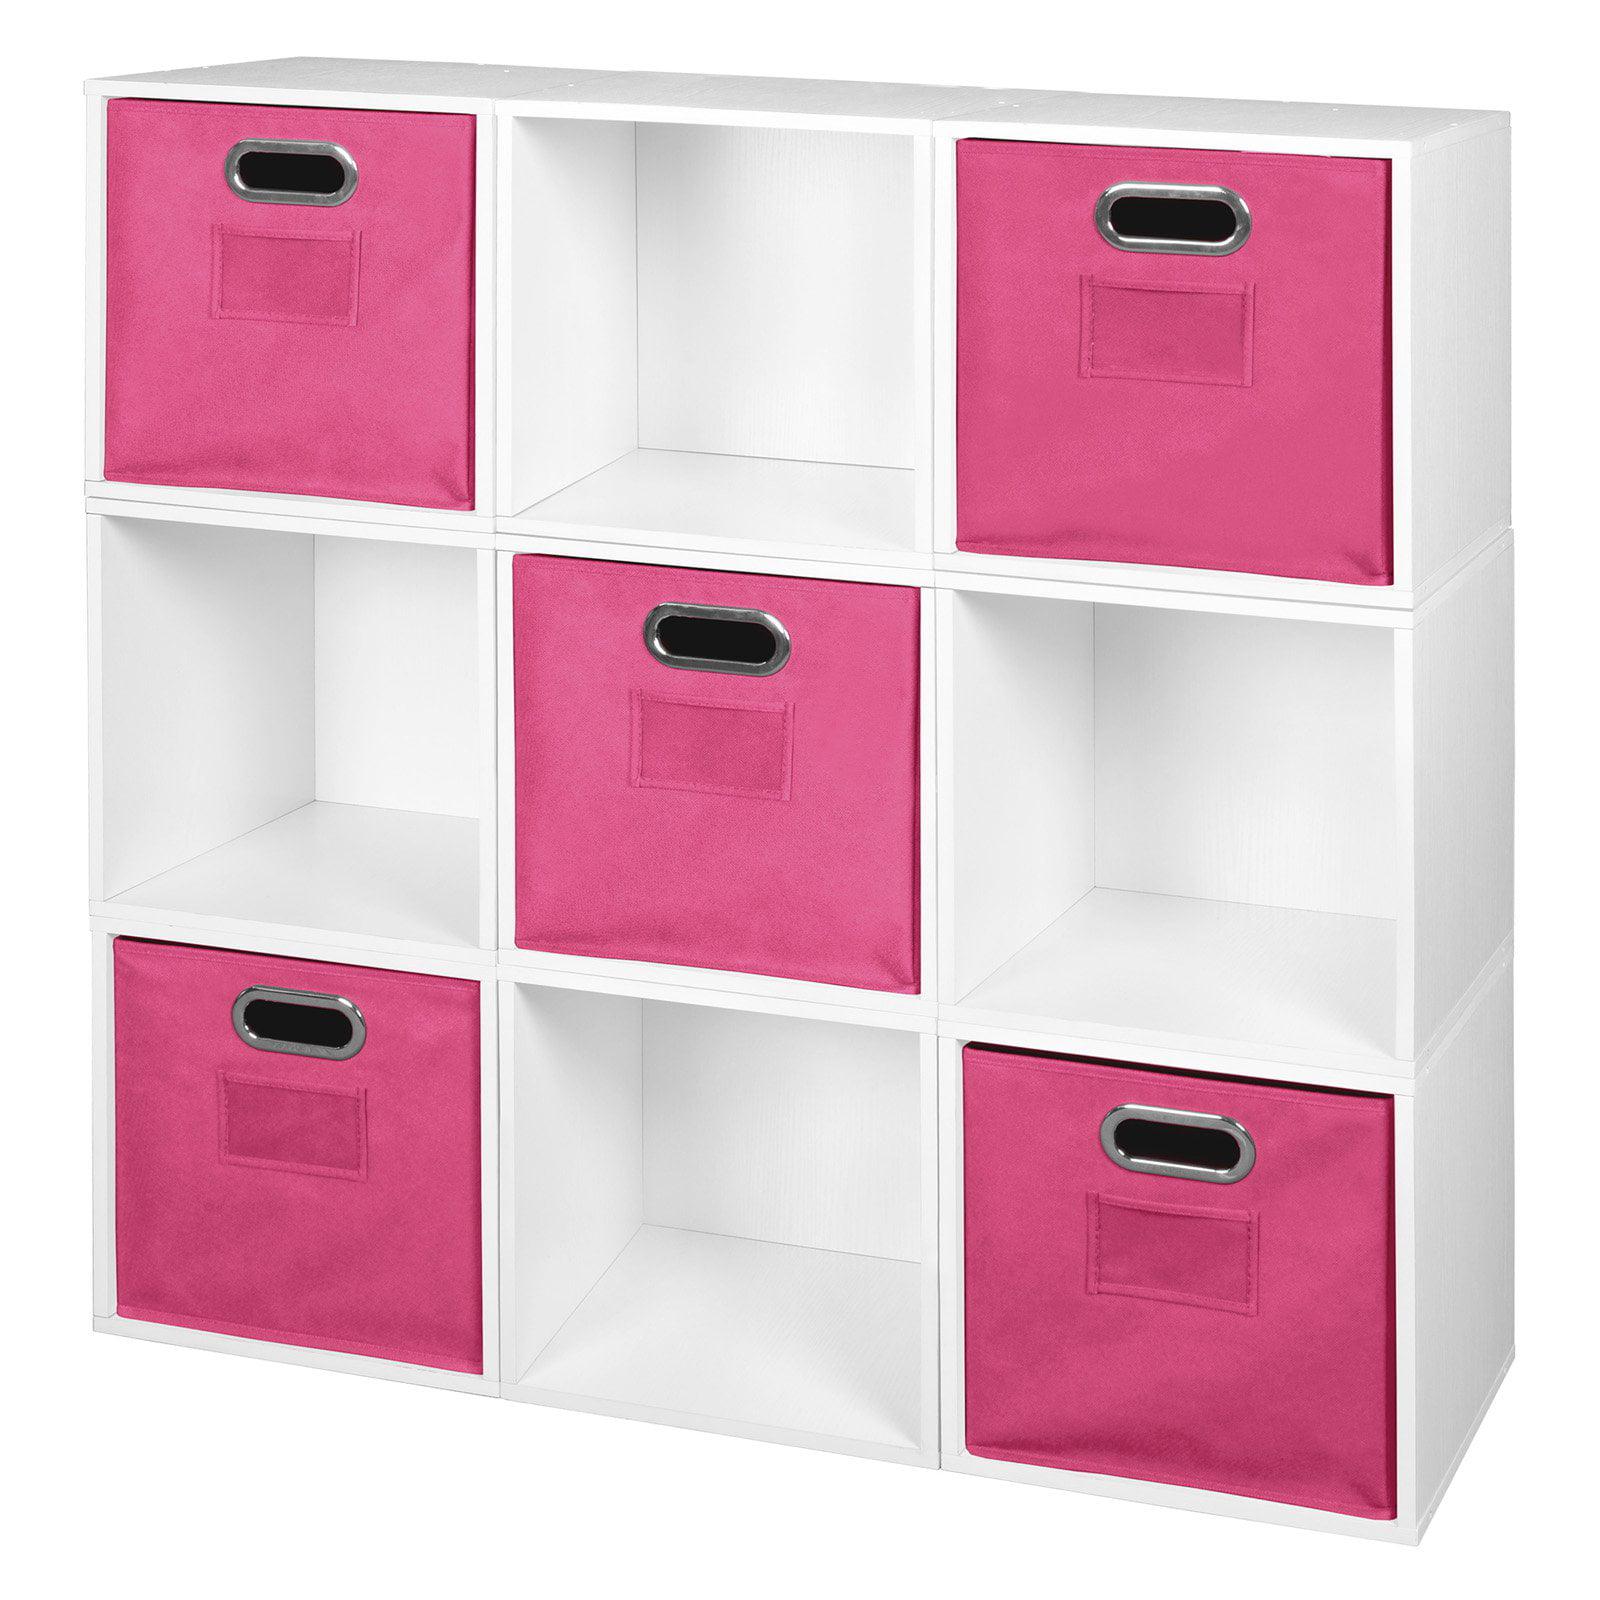 Niche Cubo Storage Set - 9 Cubes and 5 Canvas Bins